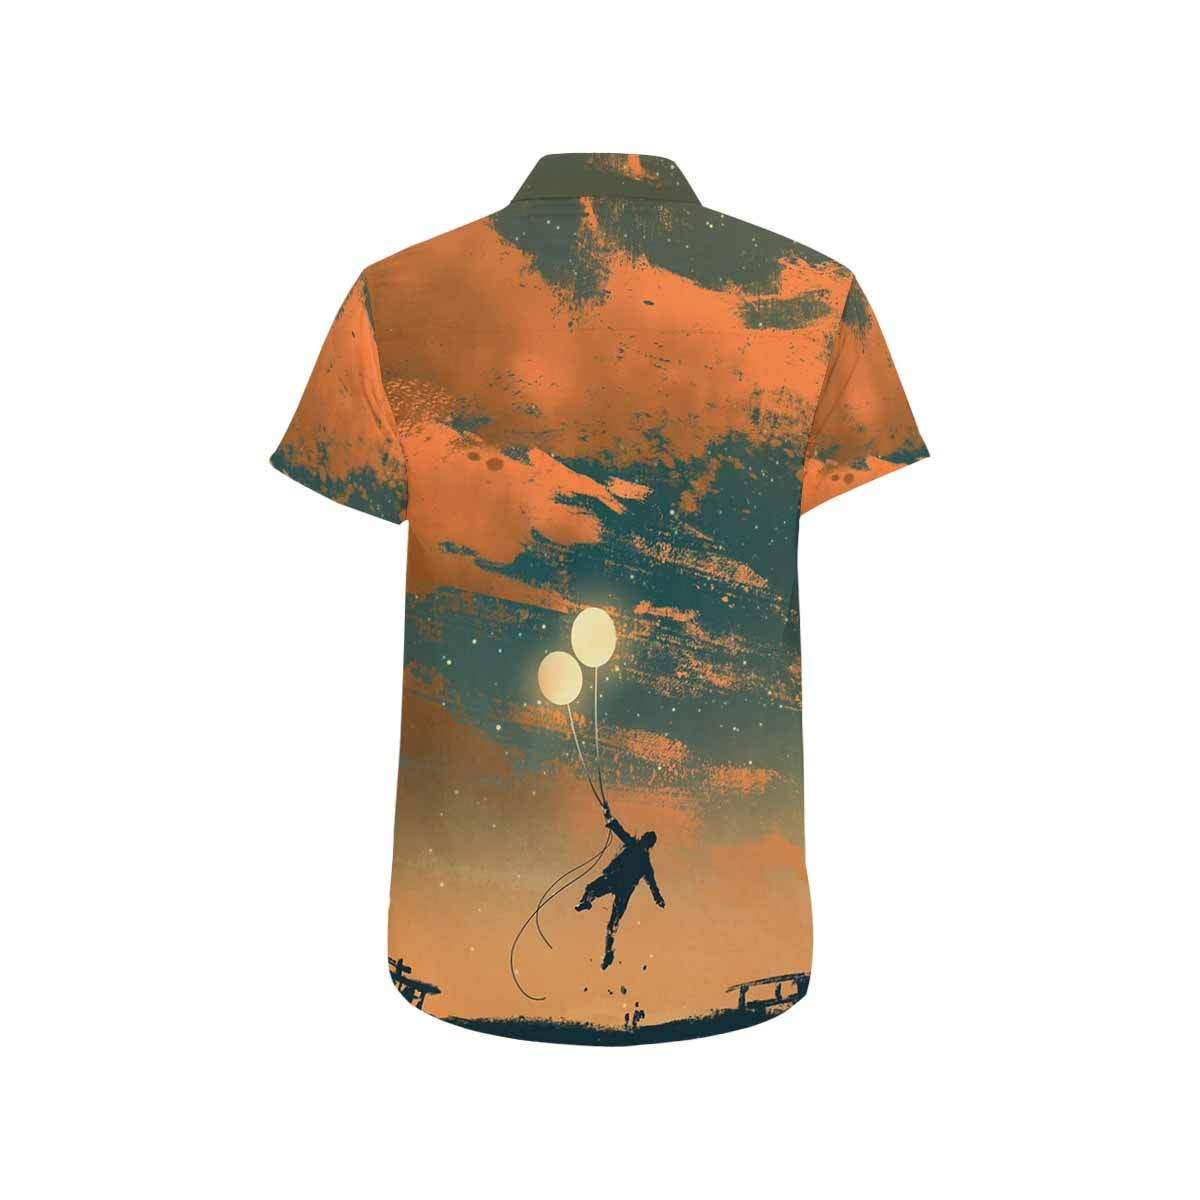 InterestPrint Mens Man Flying with Balloon Lights Short Sleeve Shirt S-5XL